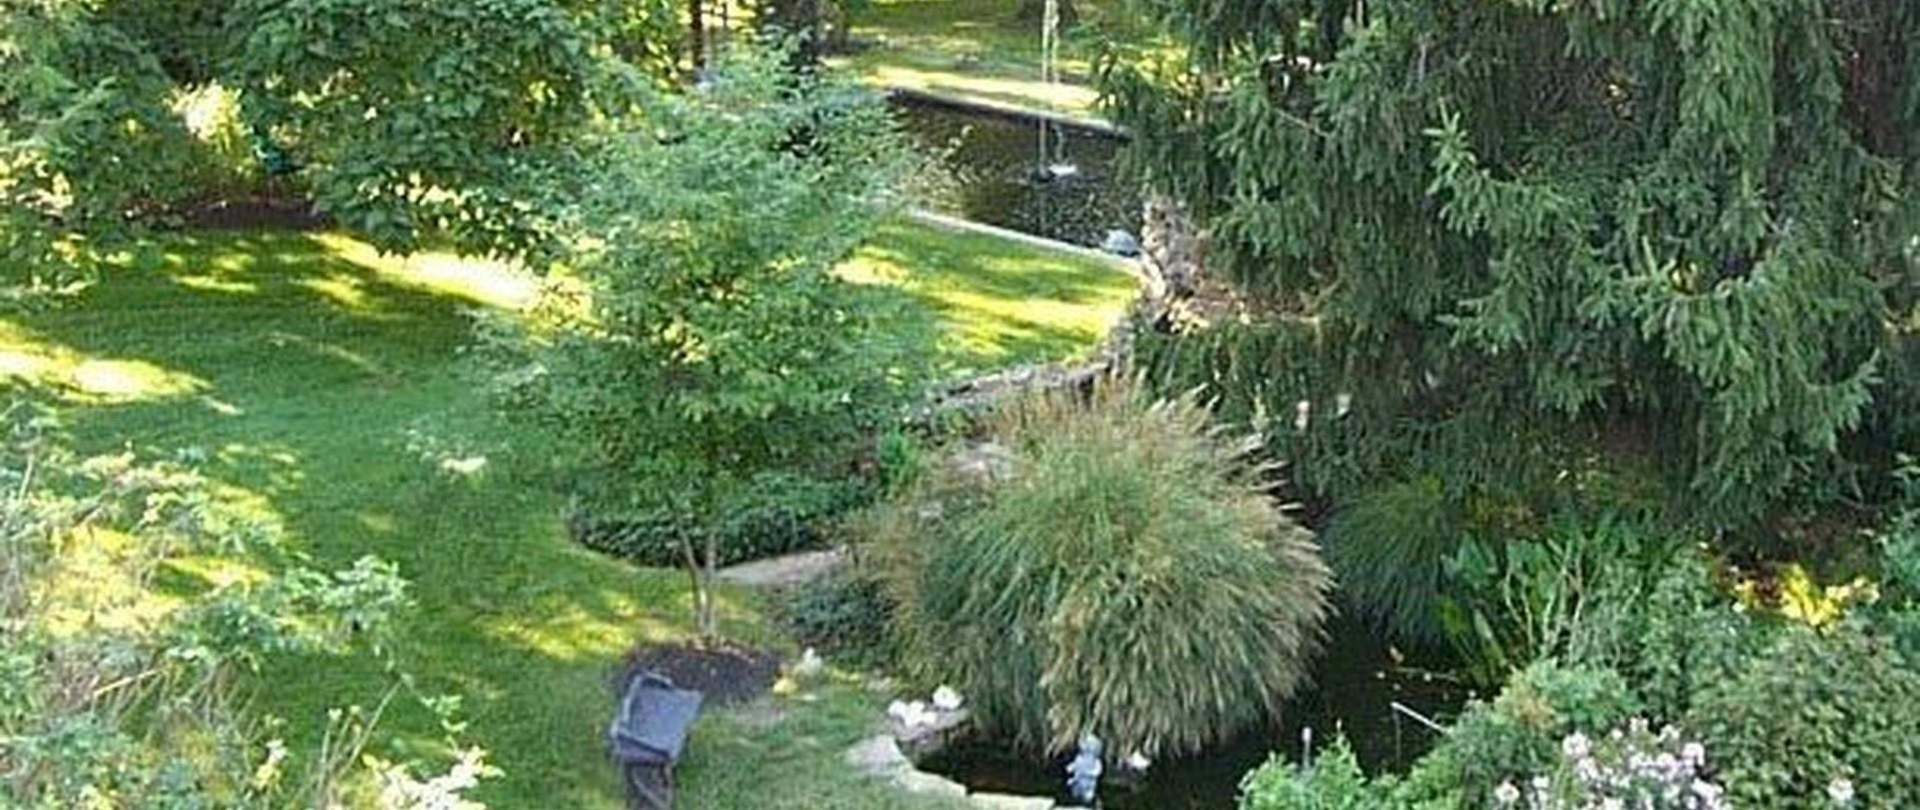 ponds.jpg.1920x810_0_494_31321.jpeg